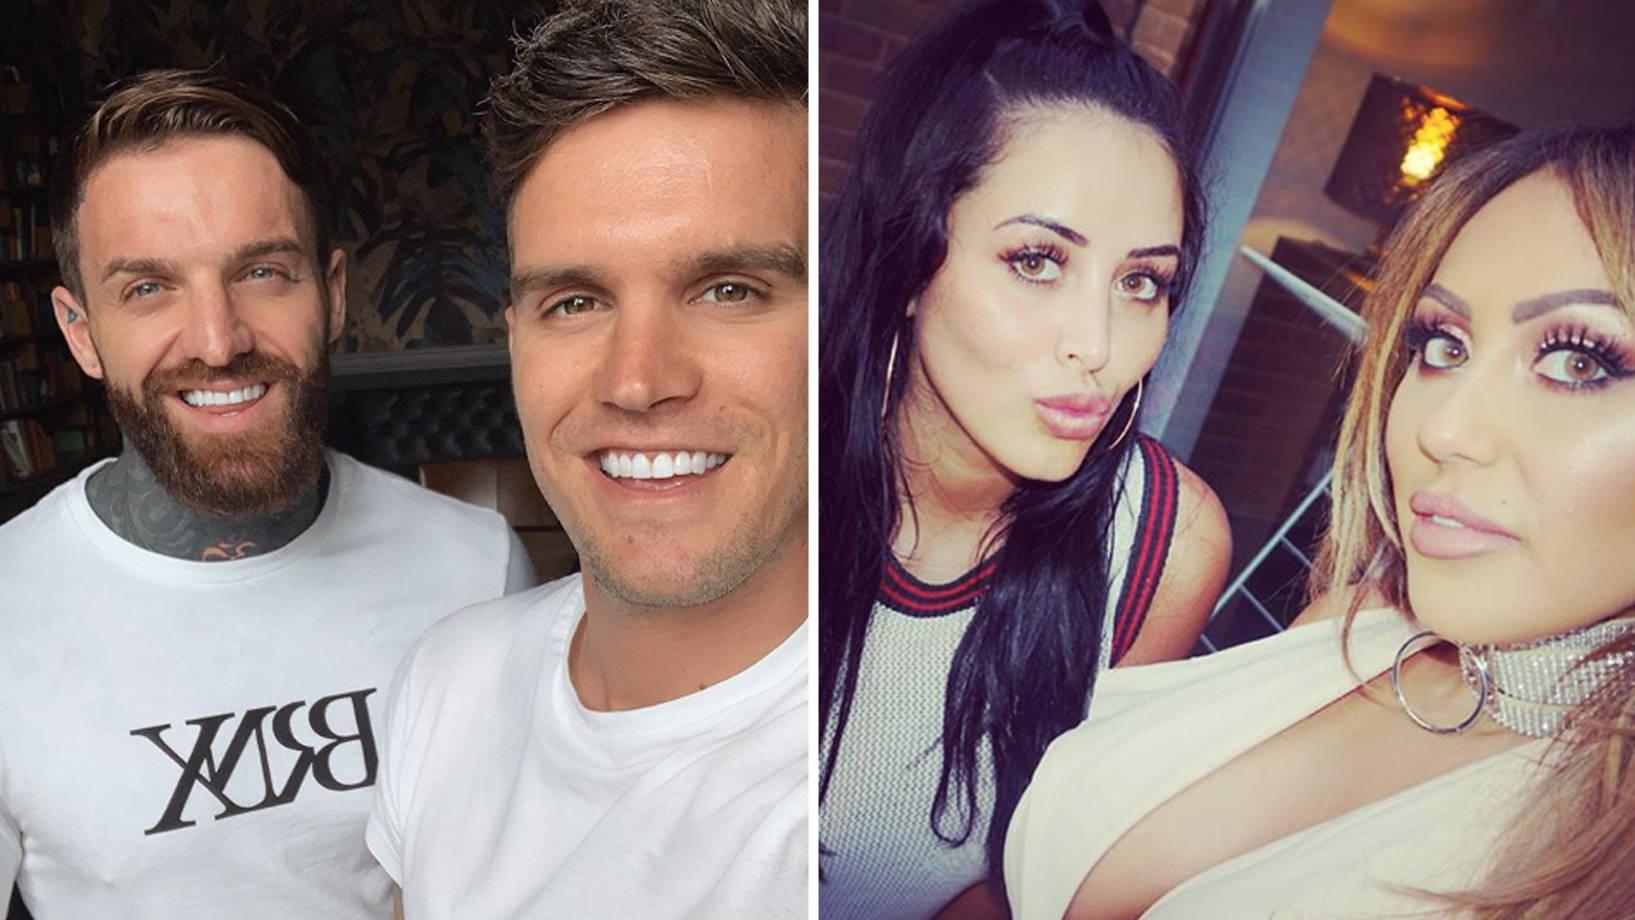 Besten online-dating-sites sydney